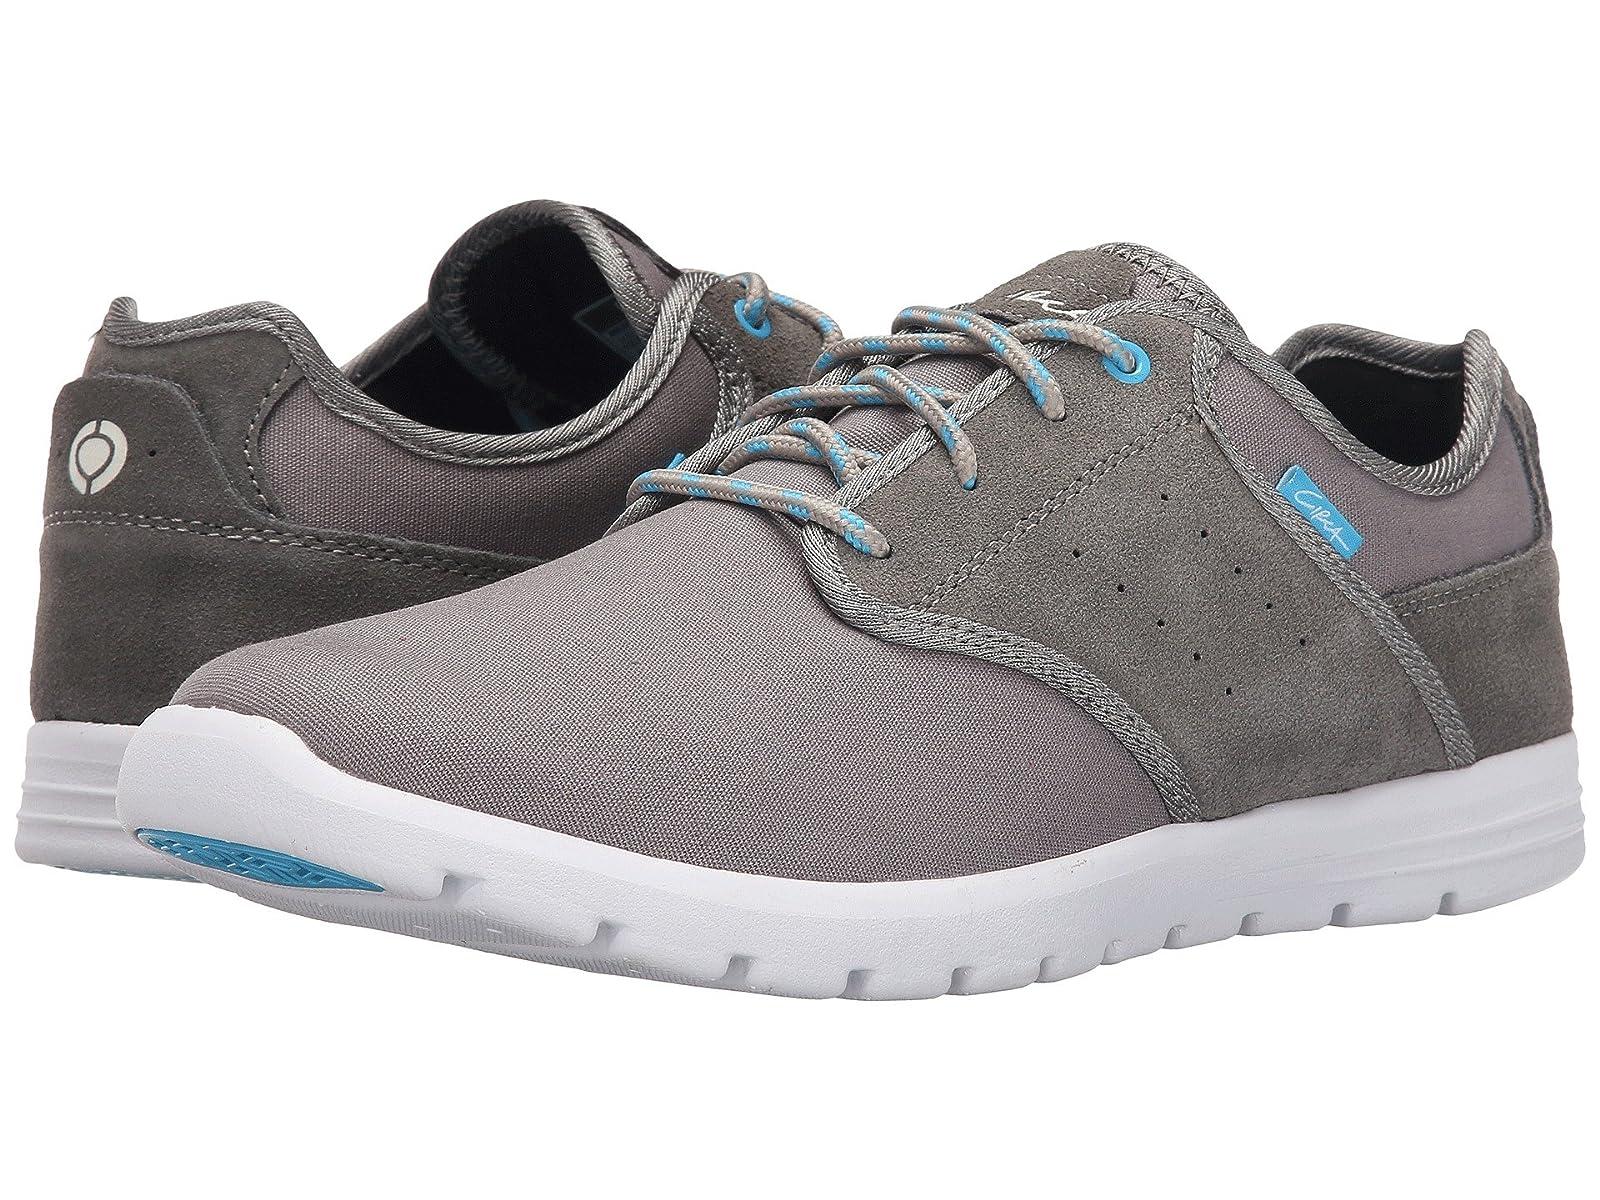 Circa AtlasCheap and distinctive eye-catching shoes